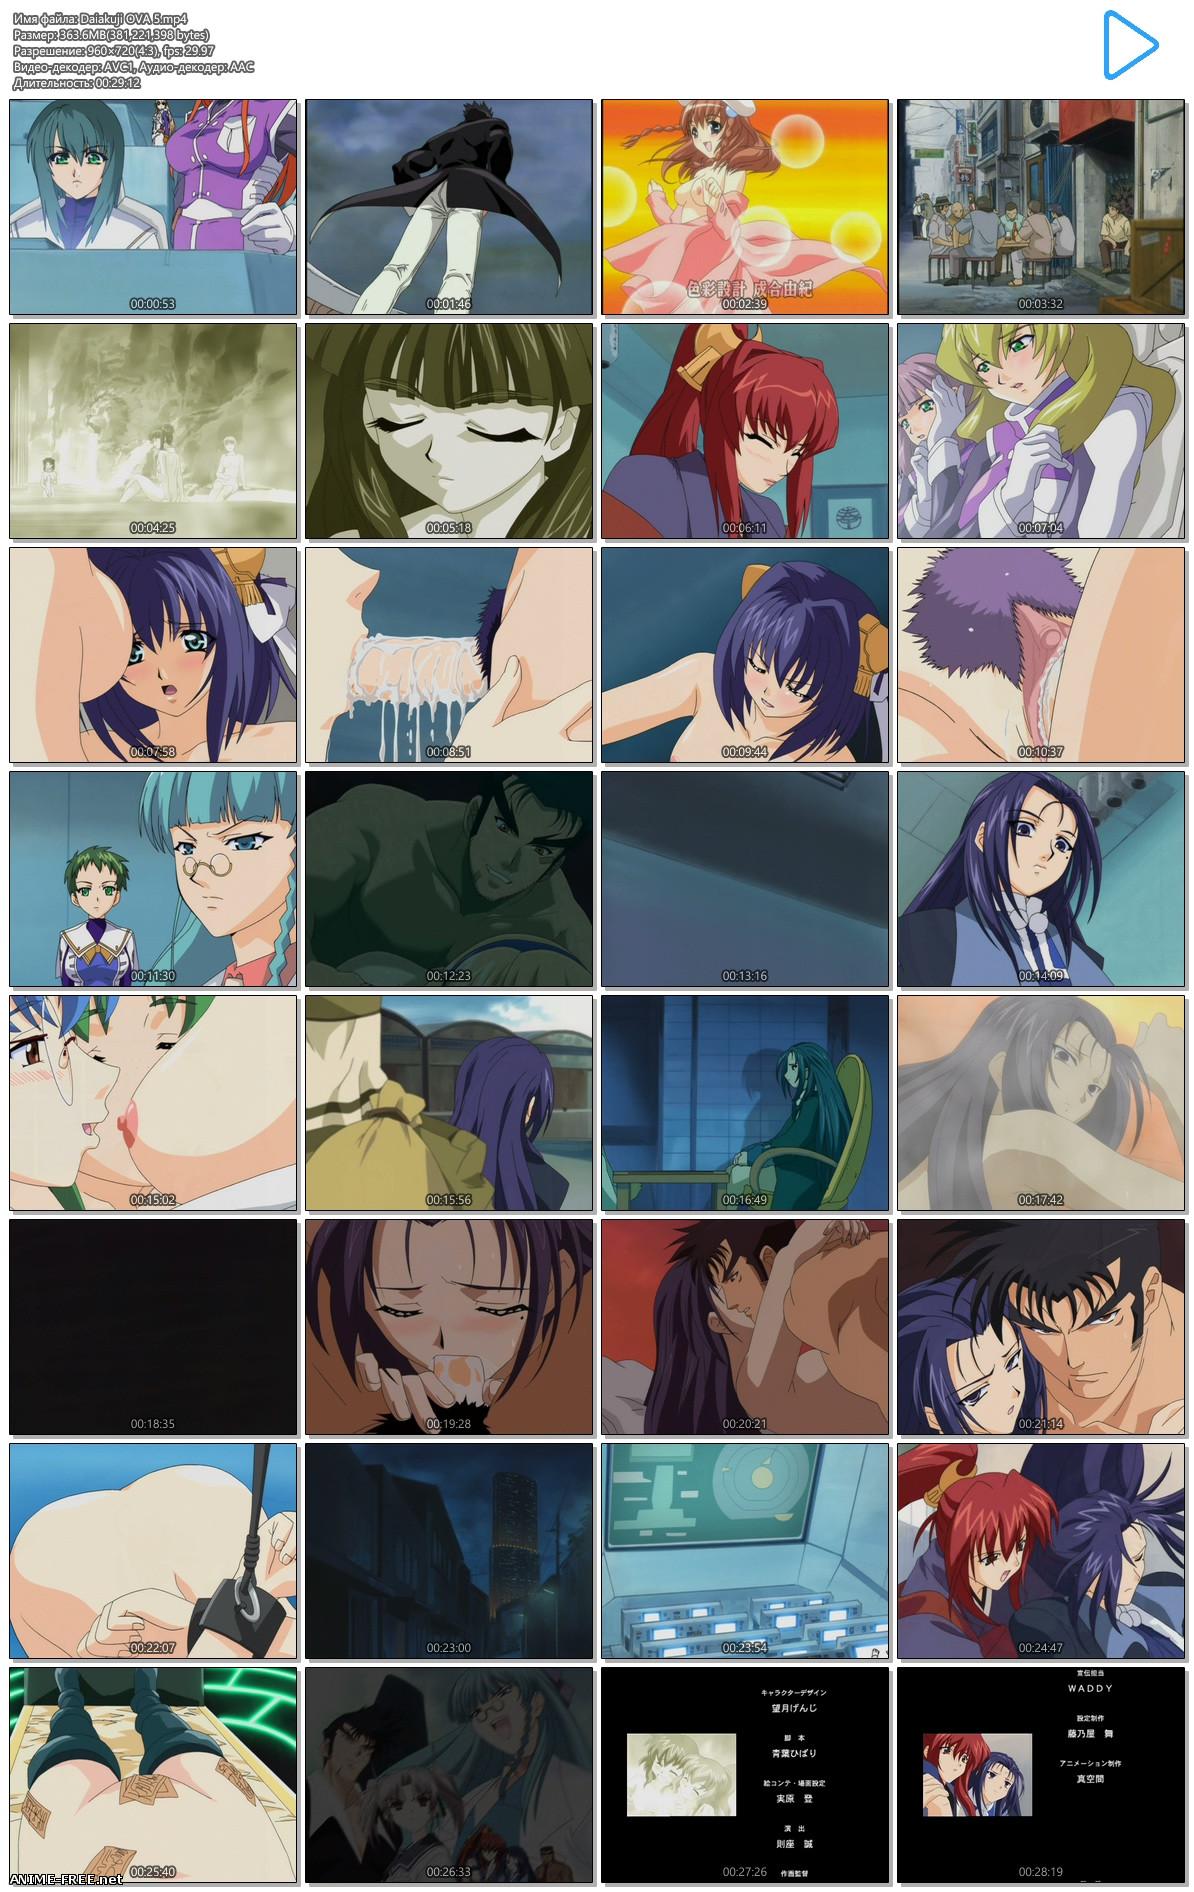 Daiakuji / Daiakuji -The Xena Buster- / Дайакудзи [Ep.1-6 + Special 1-2] [JAP,ENG,RUS] [720p] Anime Hentai